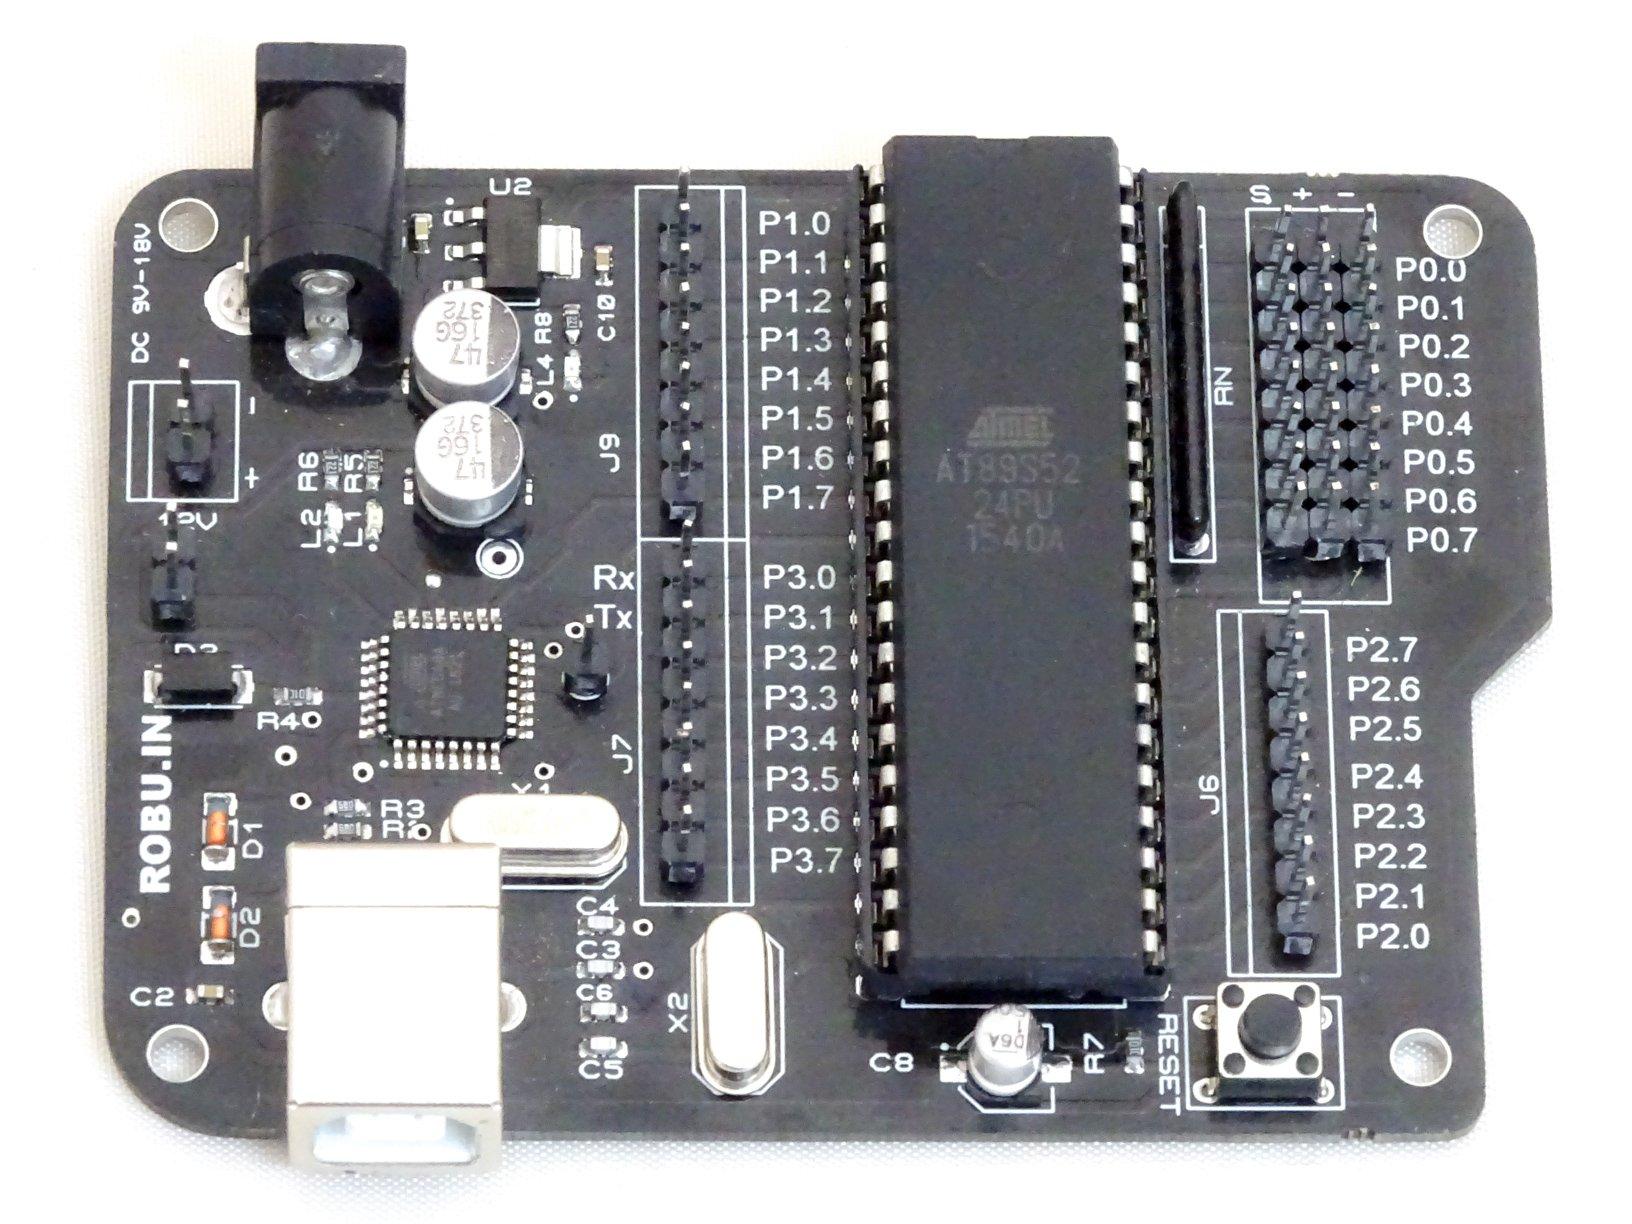 Aryabhatta 8051 Development Board AT89S52 with Onboard USB Programmer